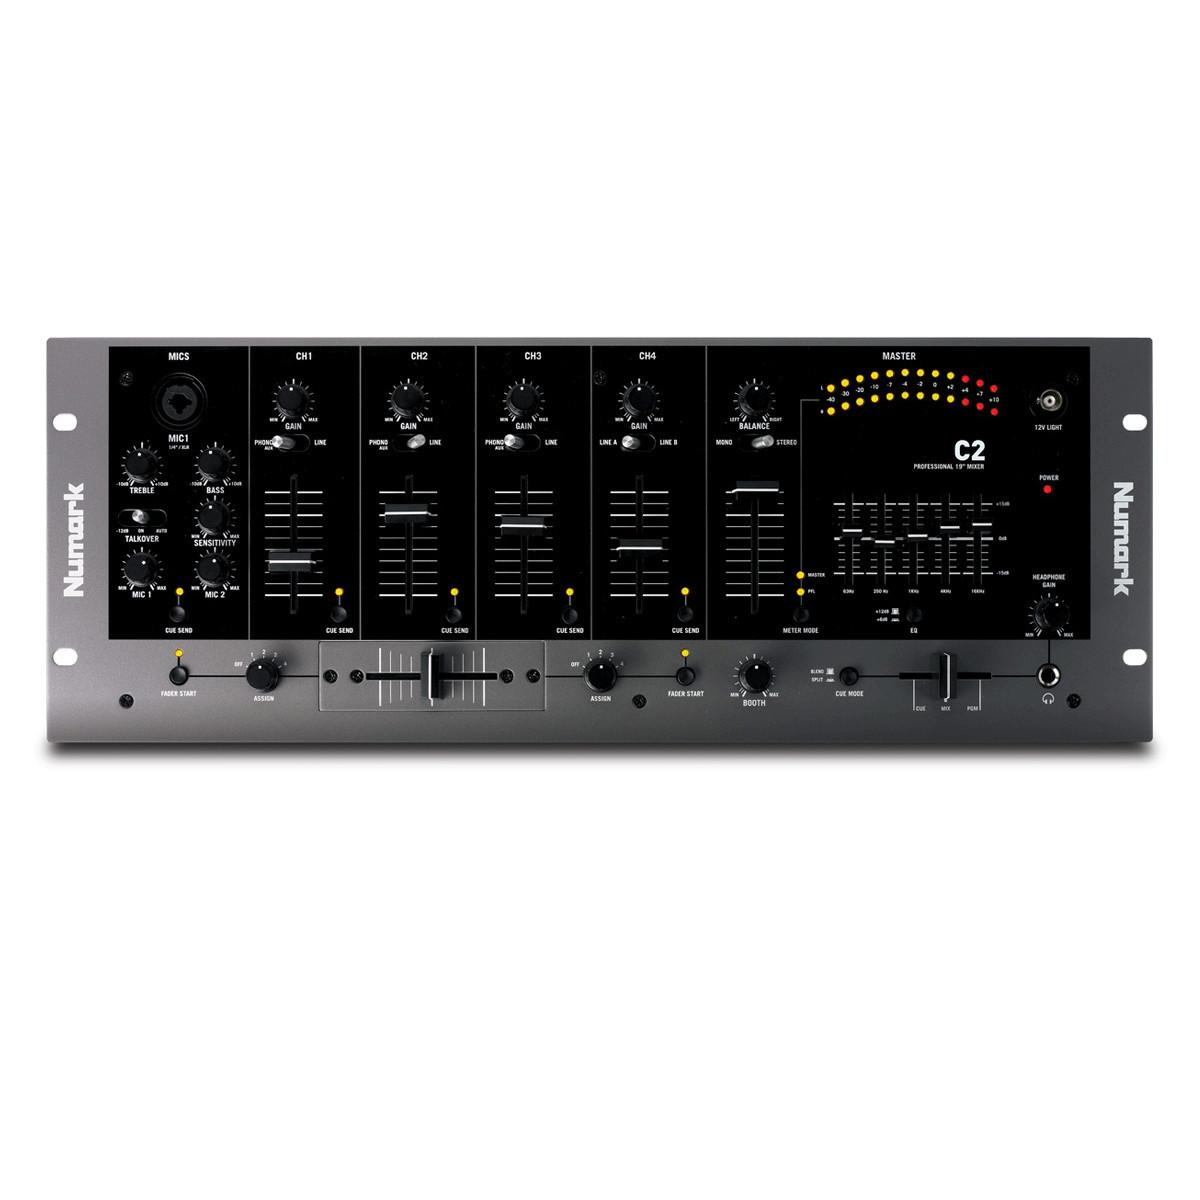 numark c2 4 channel rack dj mixer with 5 band eq at. Black Bedroom Furniture Sets. Home Design Ideas